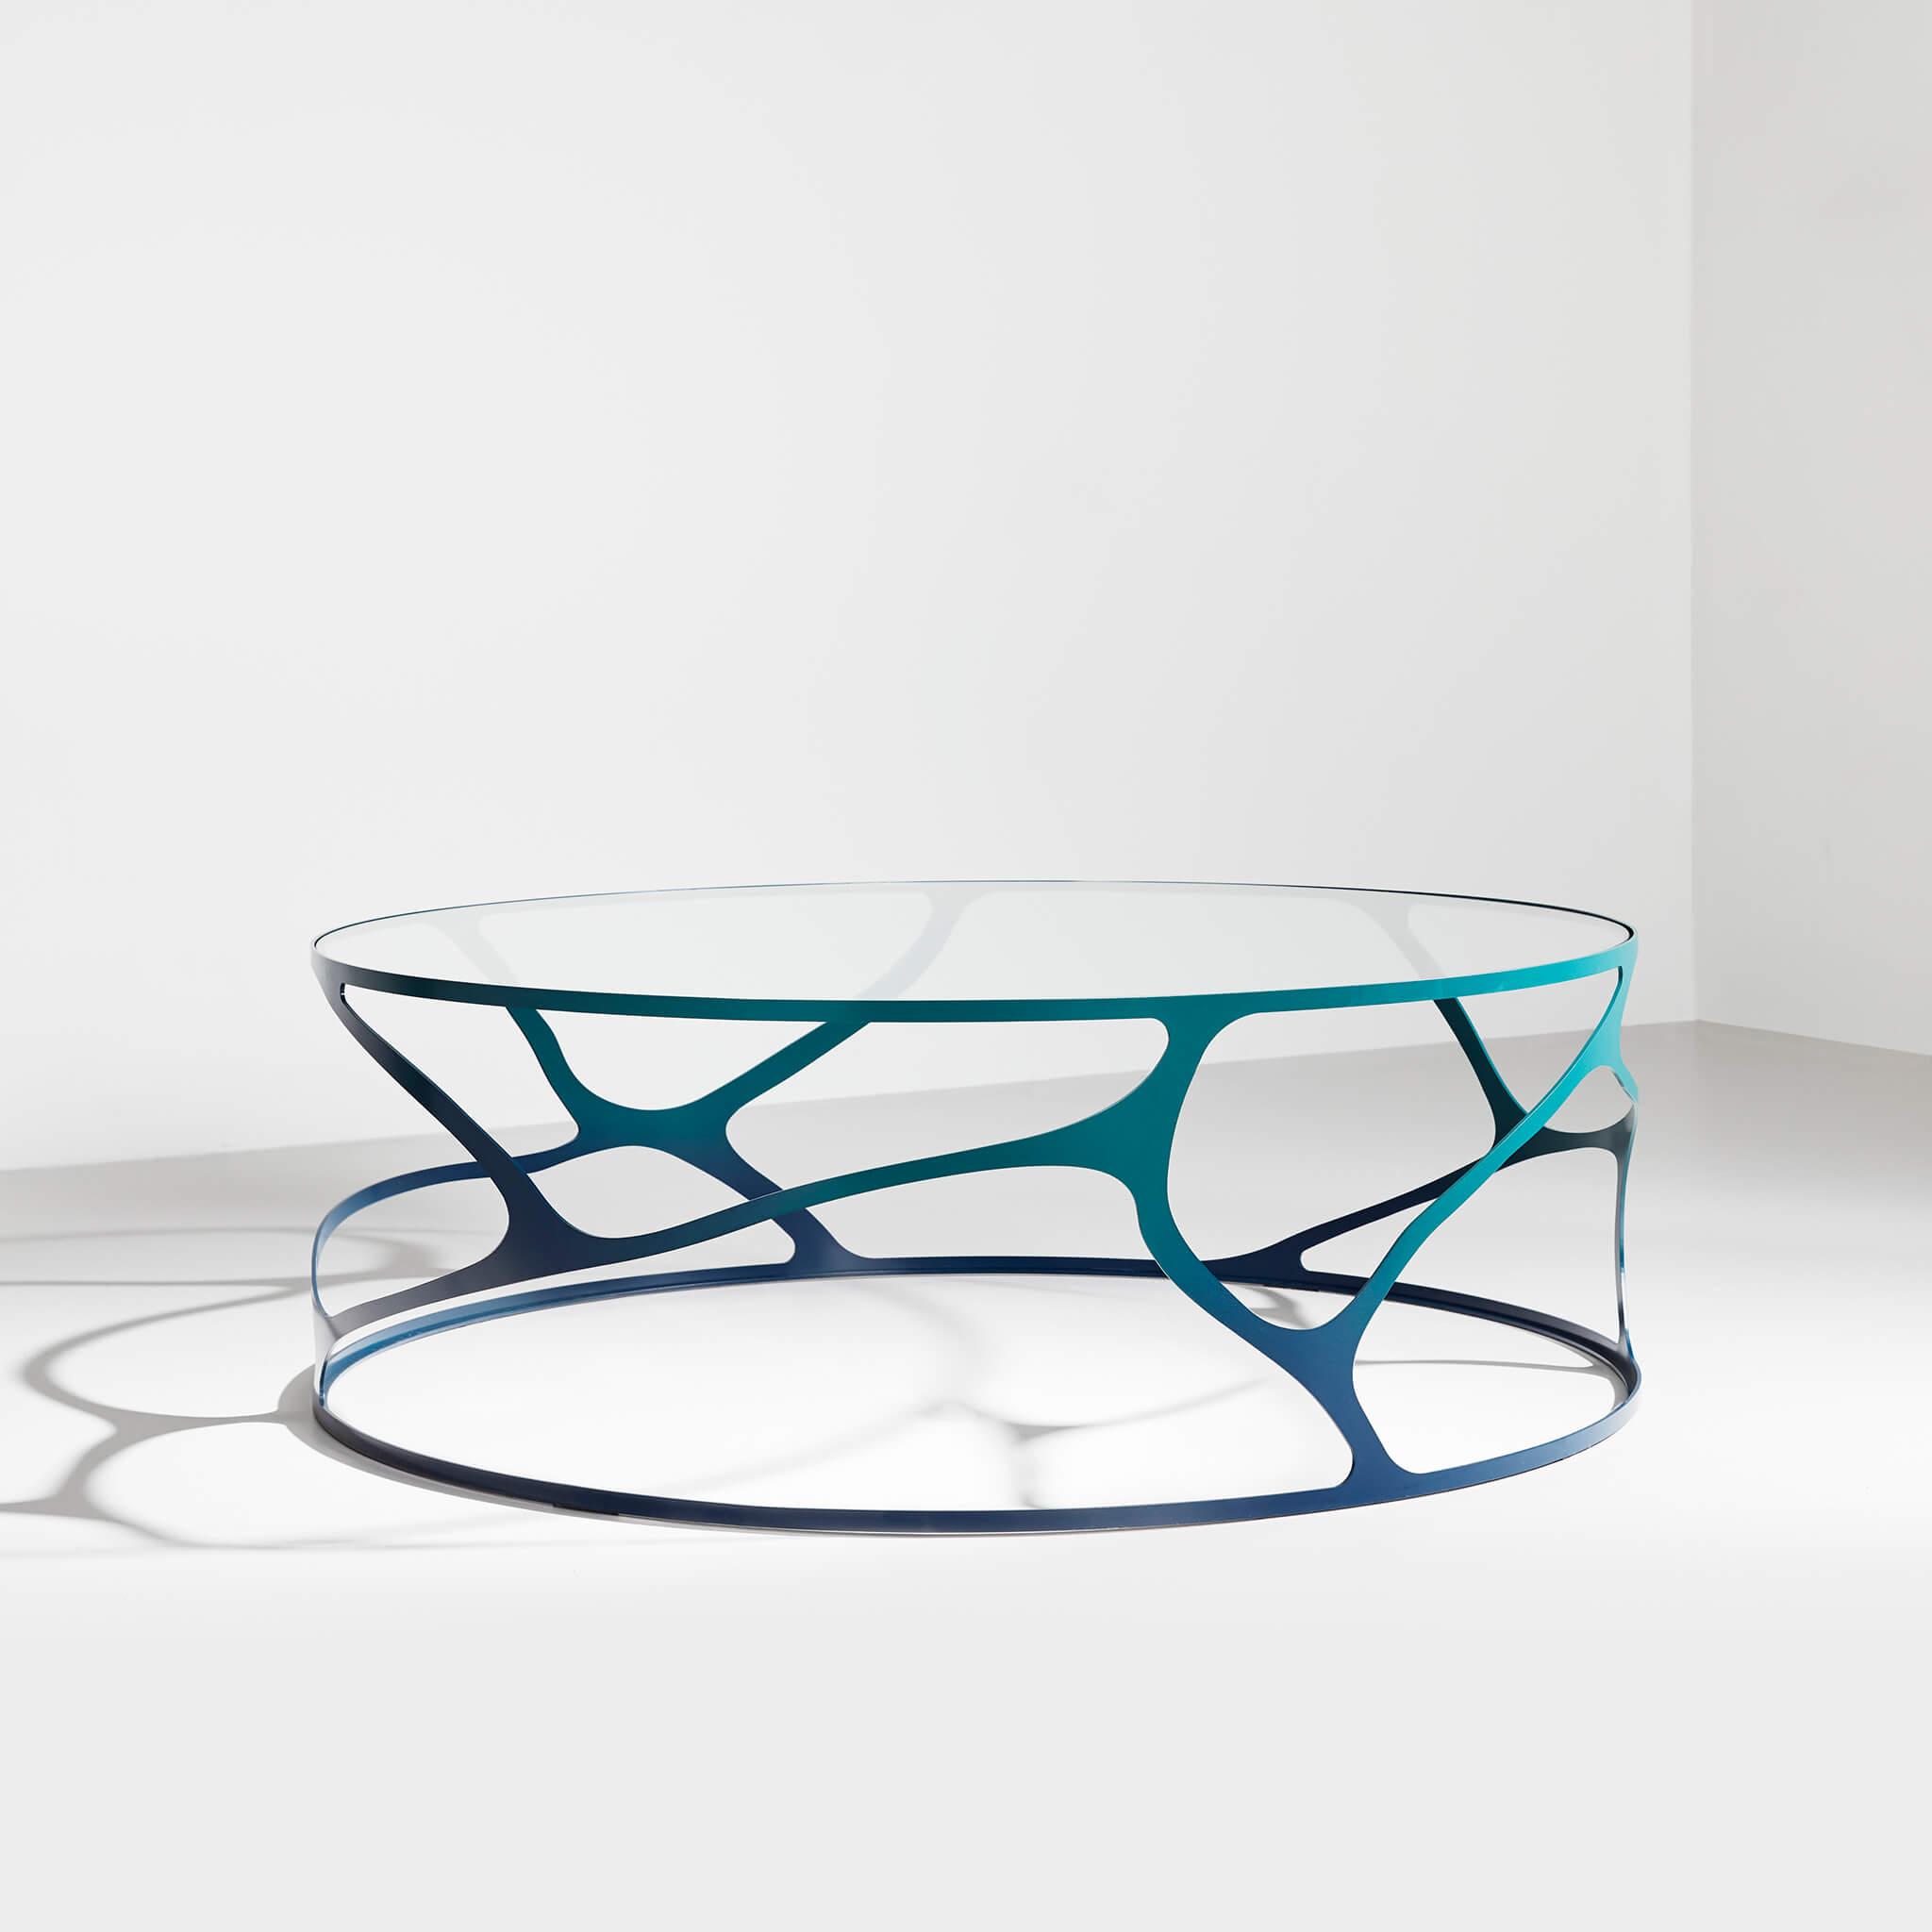 Tom-Faulkner_Papillon-Coffee-table-01